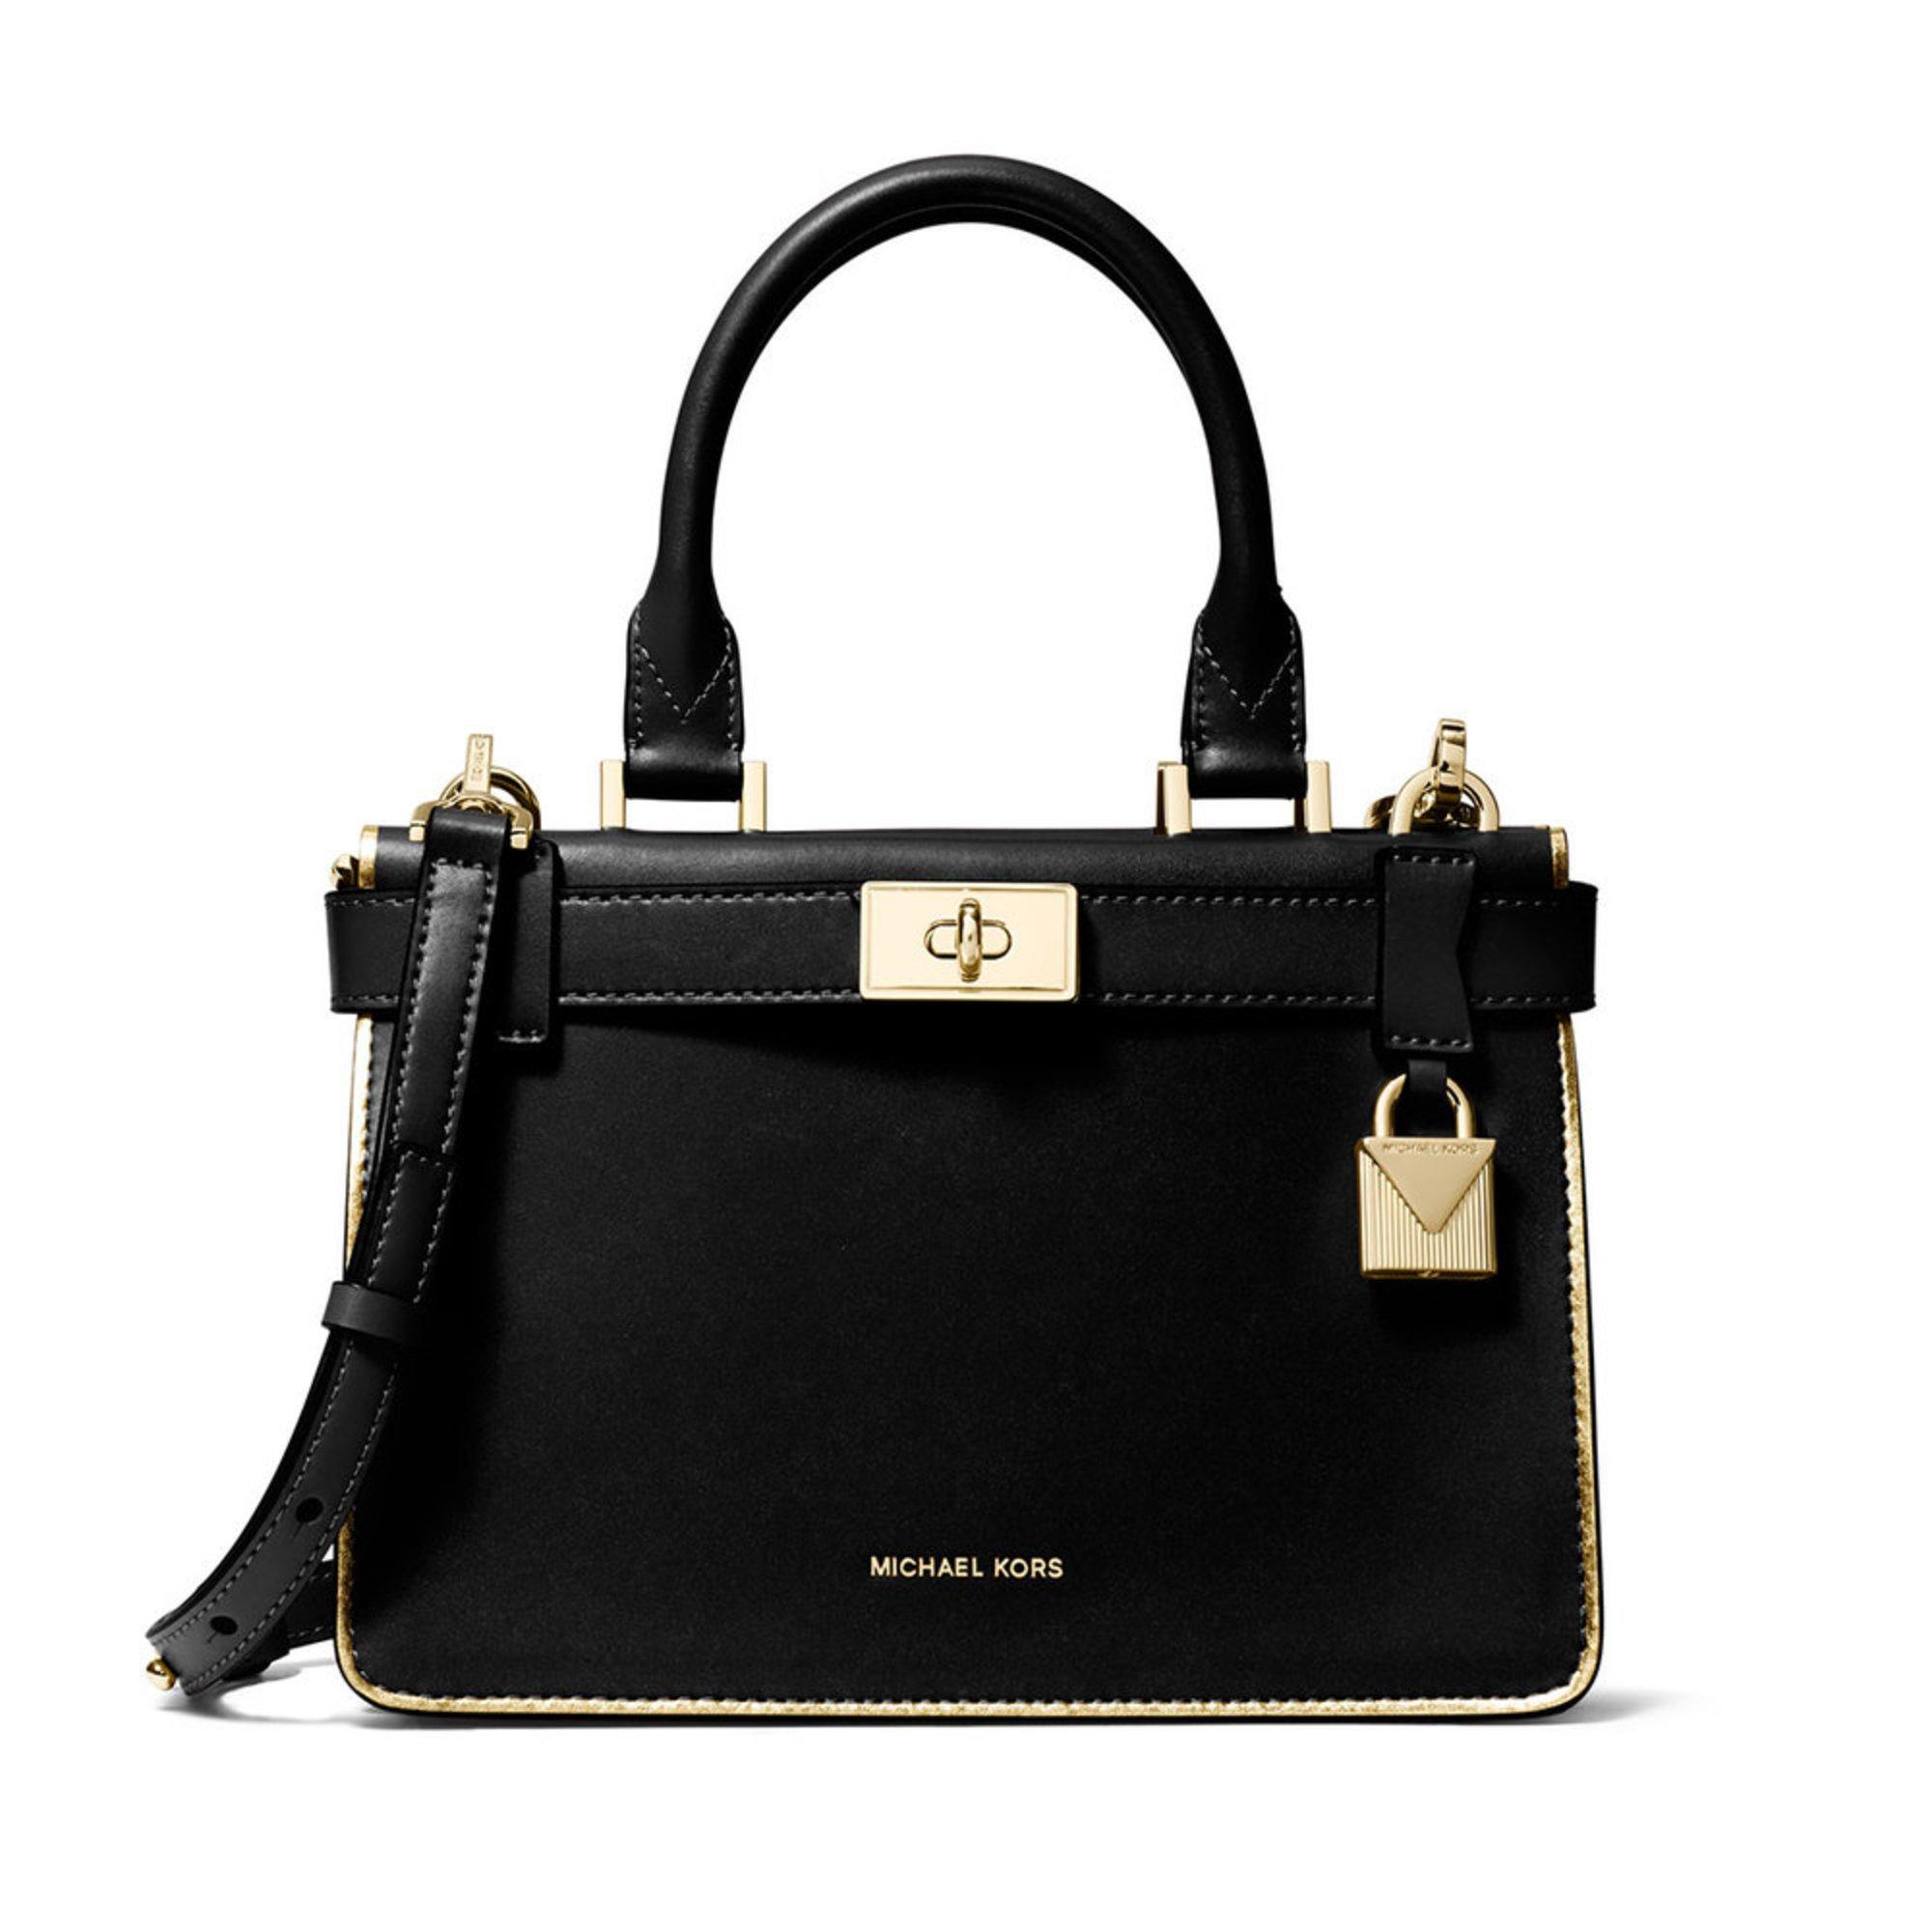 9cb08c62229e Michael Kors Tatiana Mini Satchel | Satchels | Handbags & Sunglasses - Shop  Your Navy Exchange - Official Site